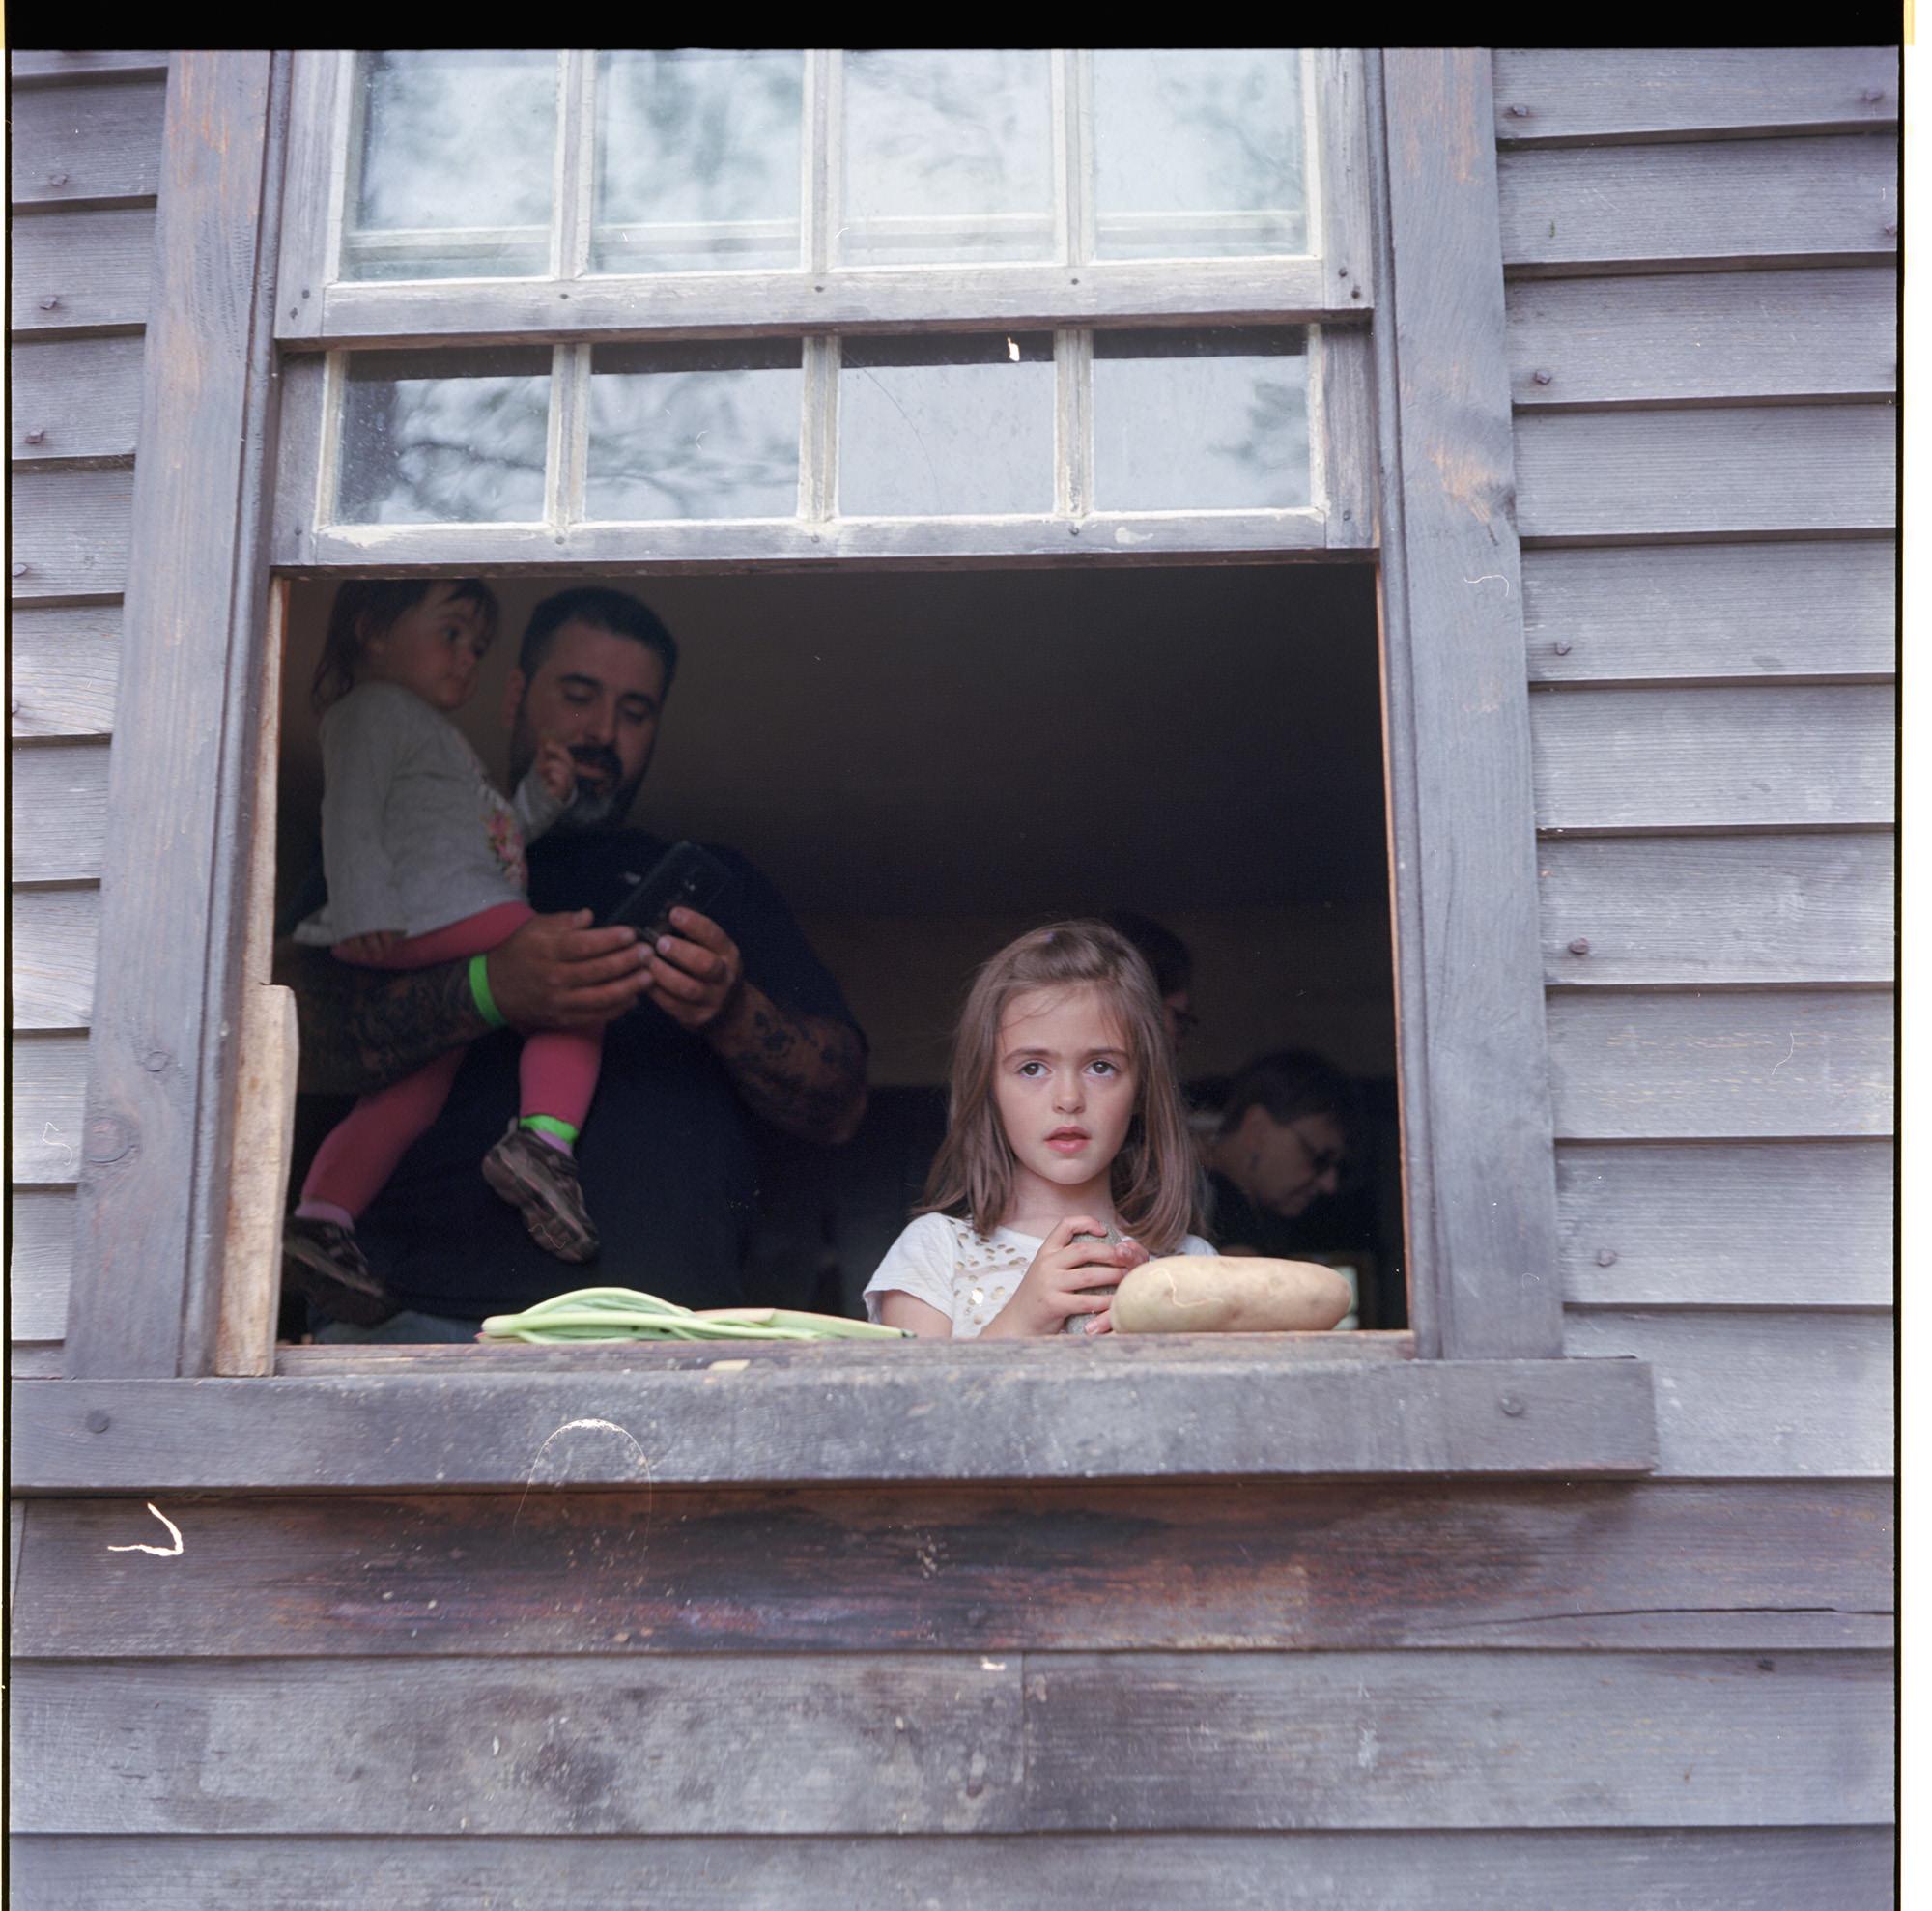 Louis_Sousa_film_photographer_06.jpg